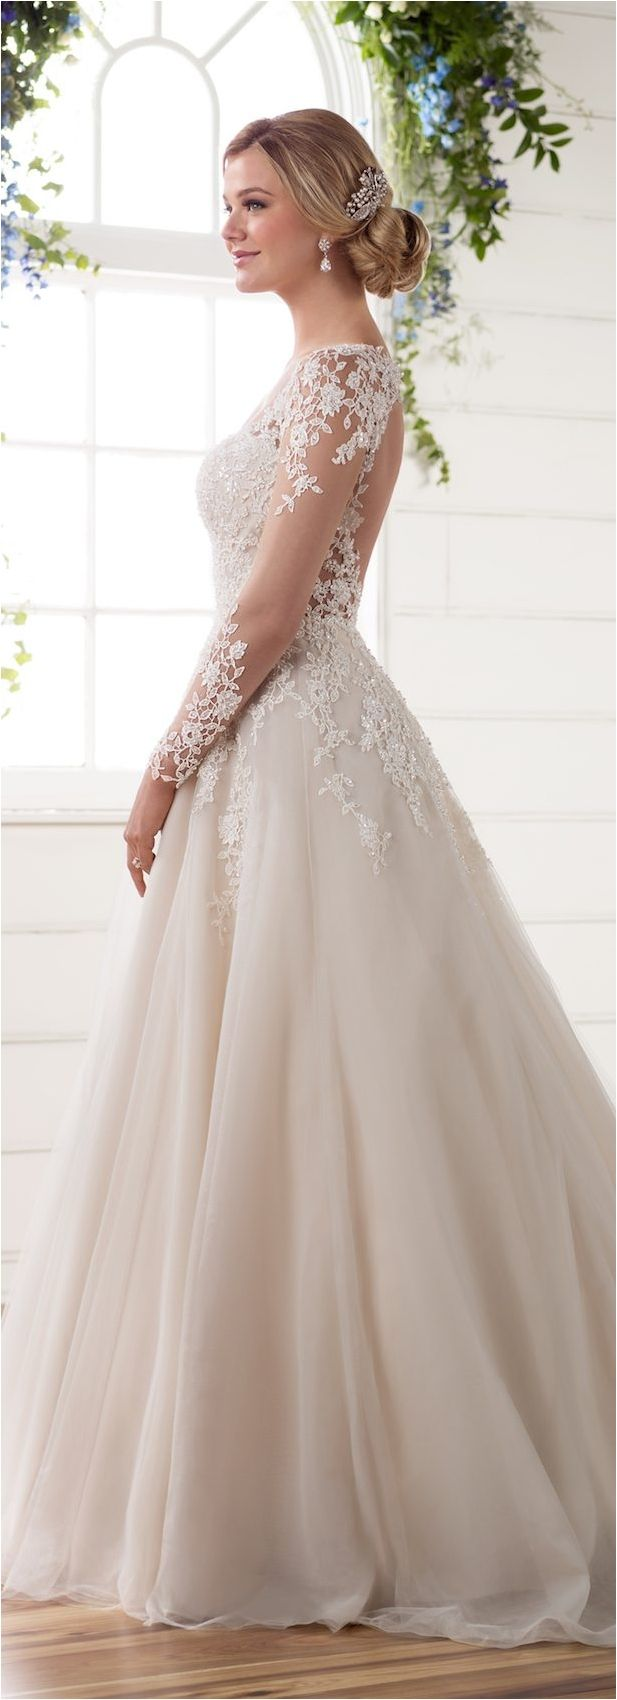 Romona keveza lace wedding dress october 2018  best I DO images on Pinterest  Bridal gowns Bridal bouquets